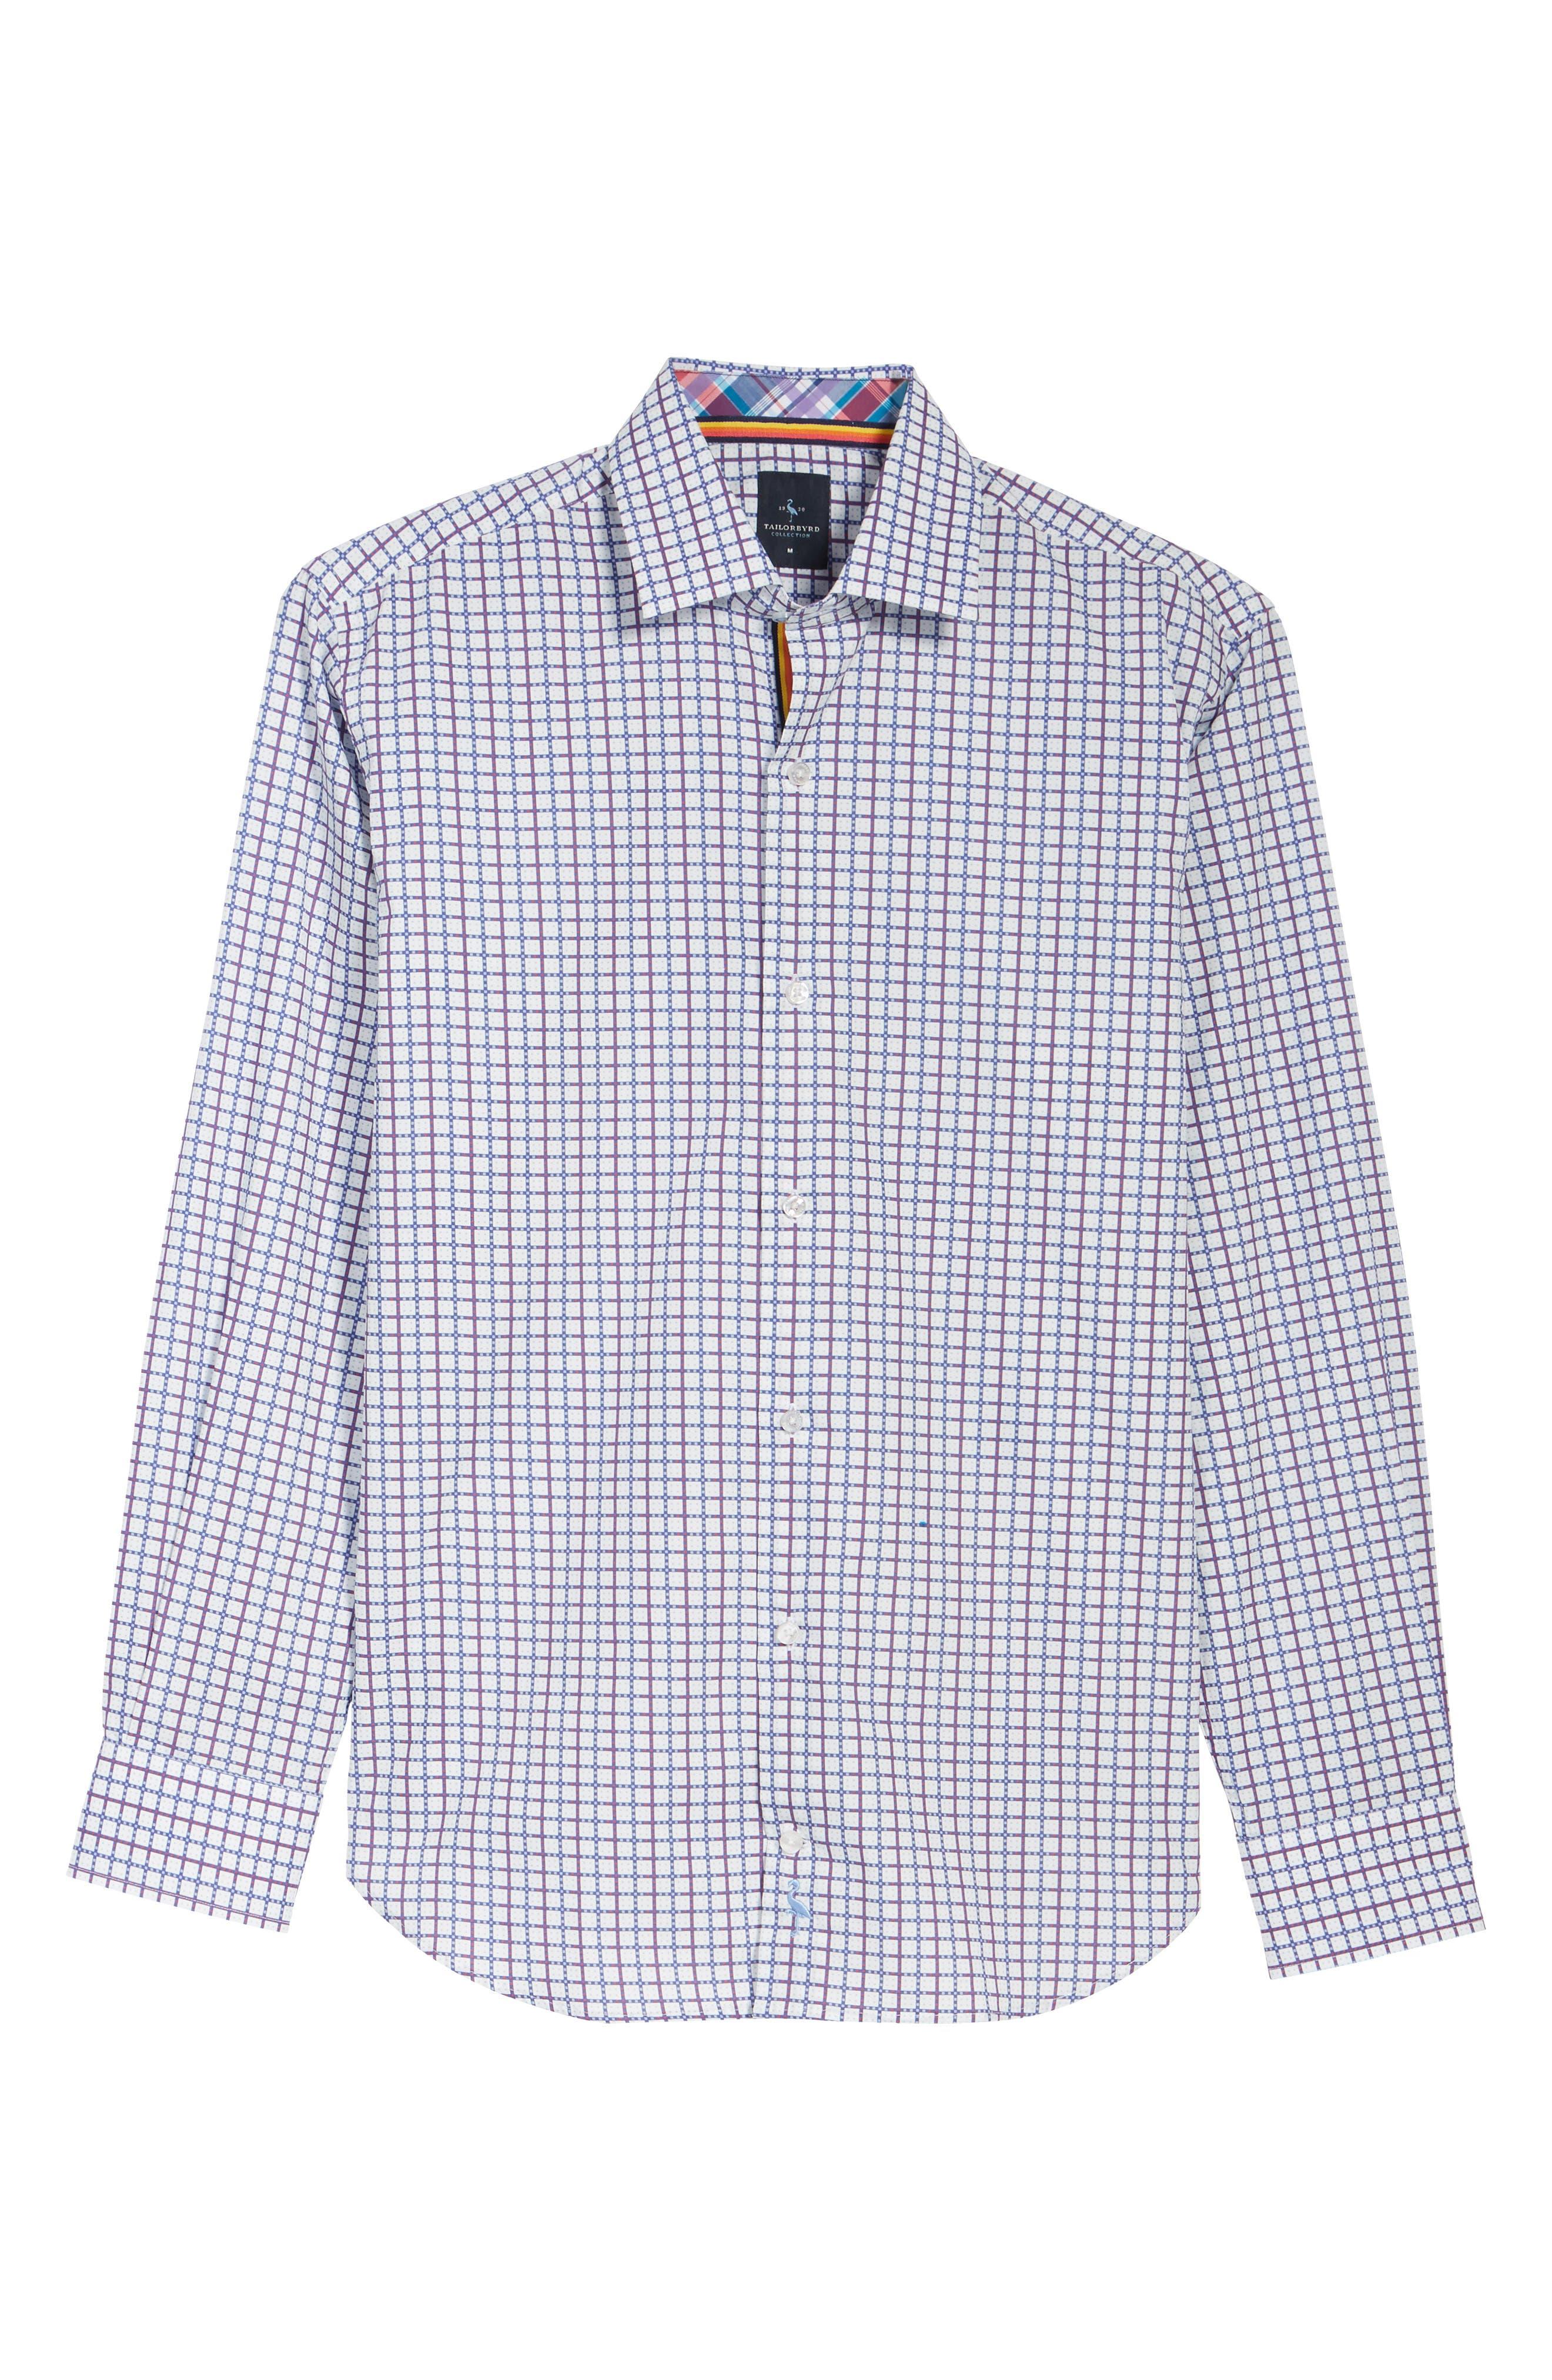 Magnolia Sport Shirt,                             Alternate thumbnail 6, color,                             500